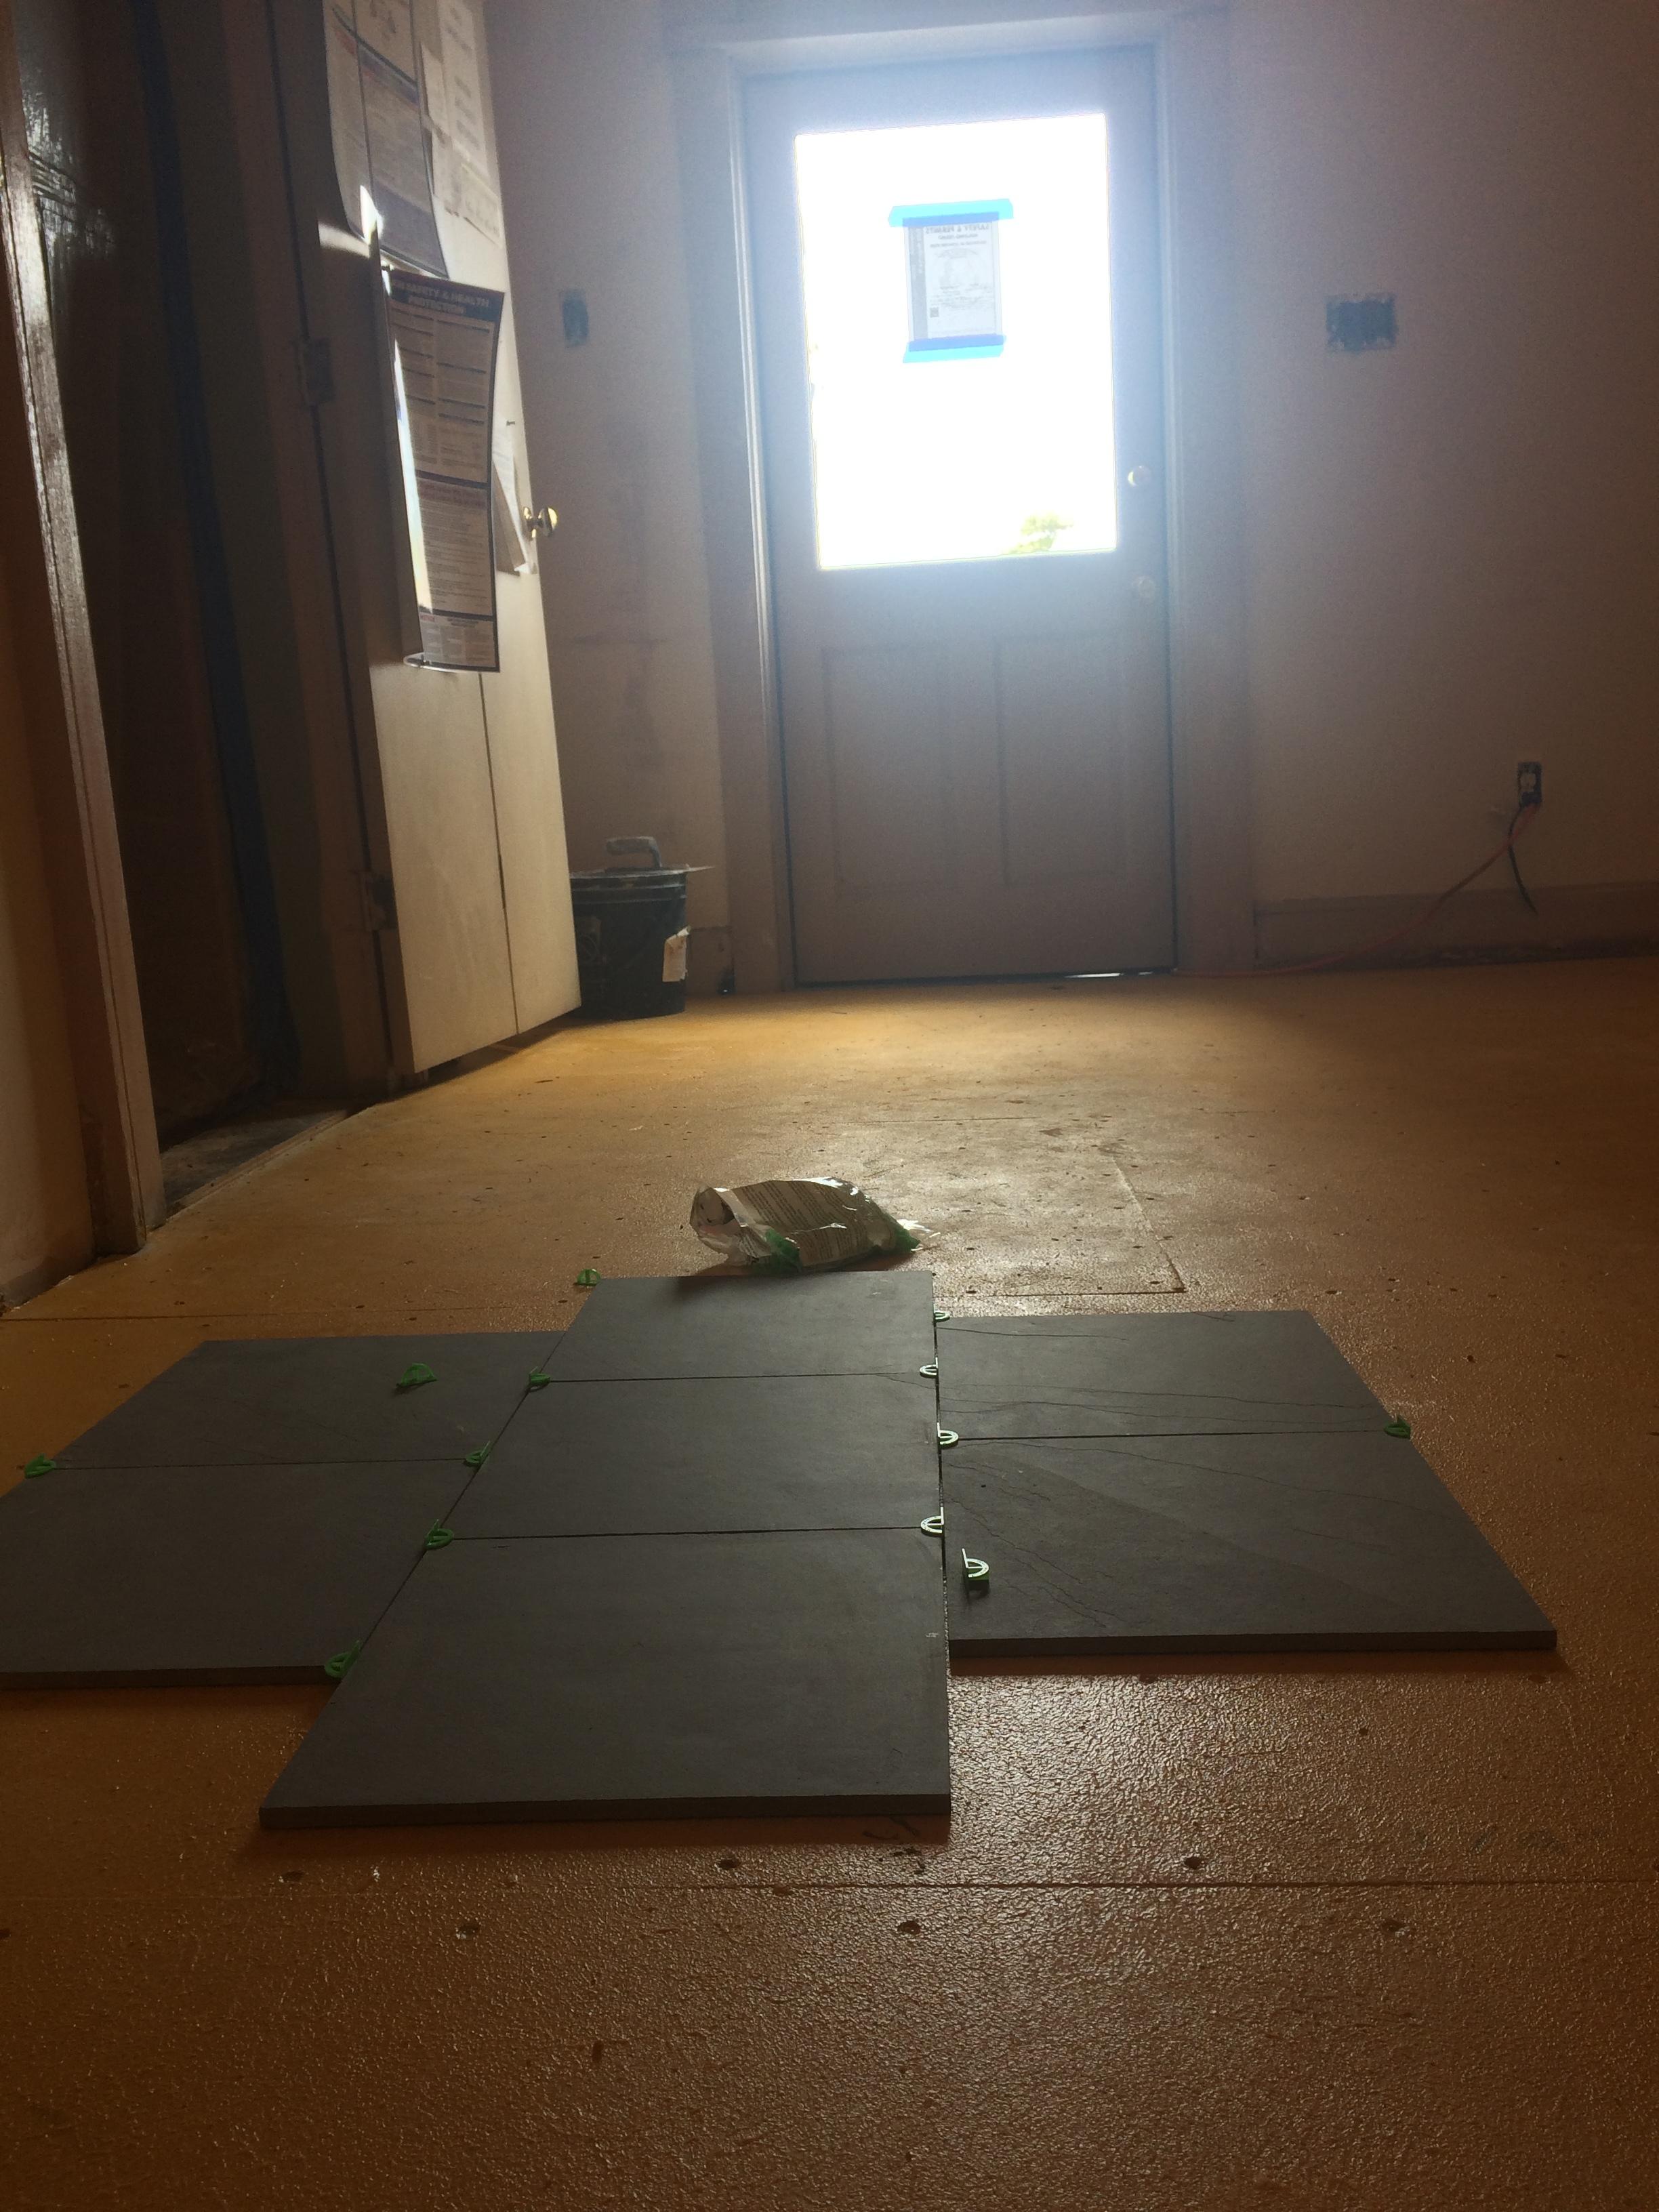 new kitchen tiles arrived!